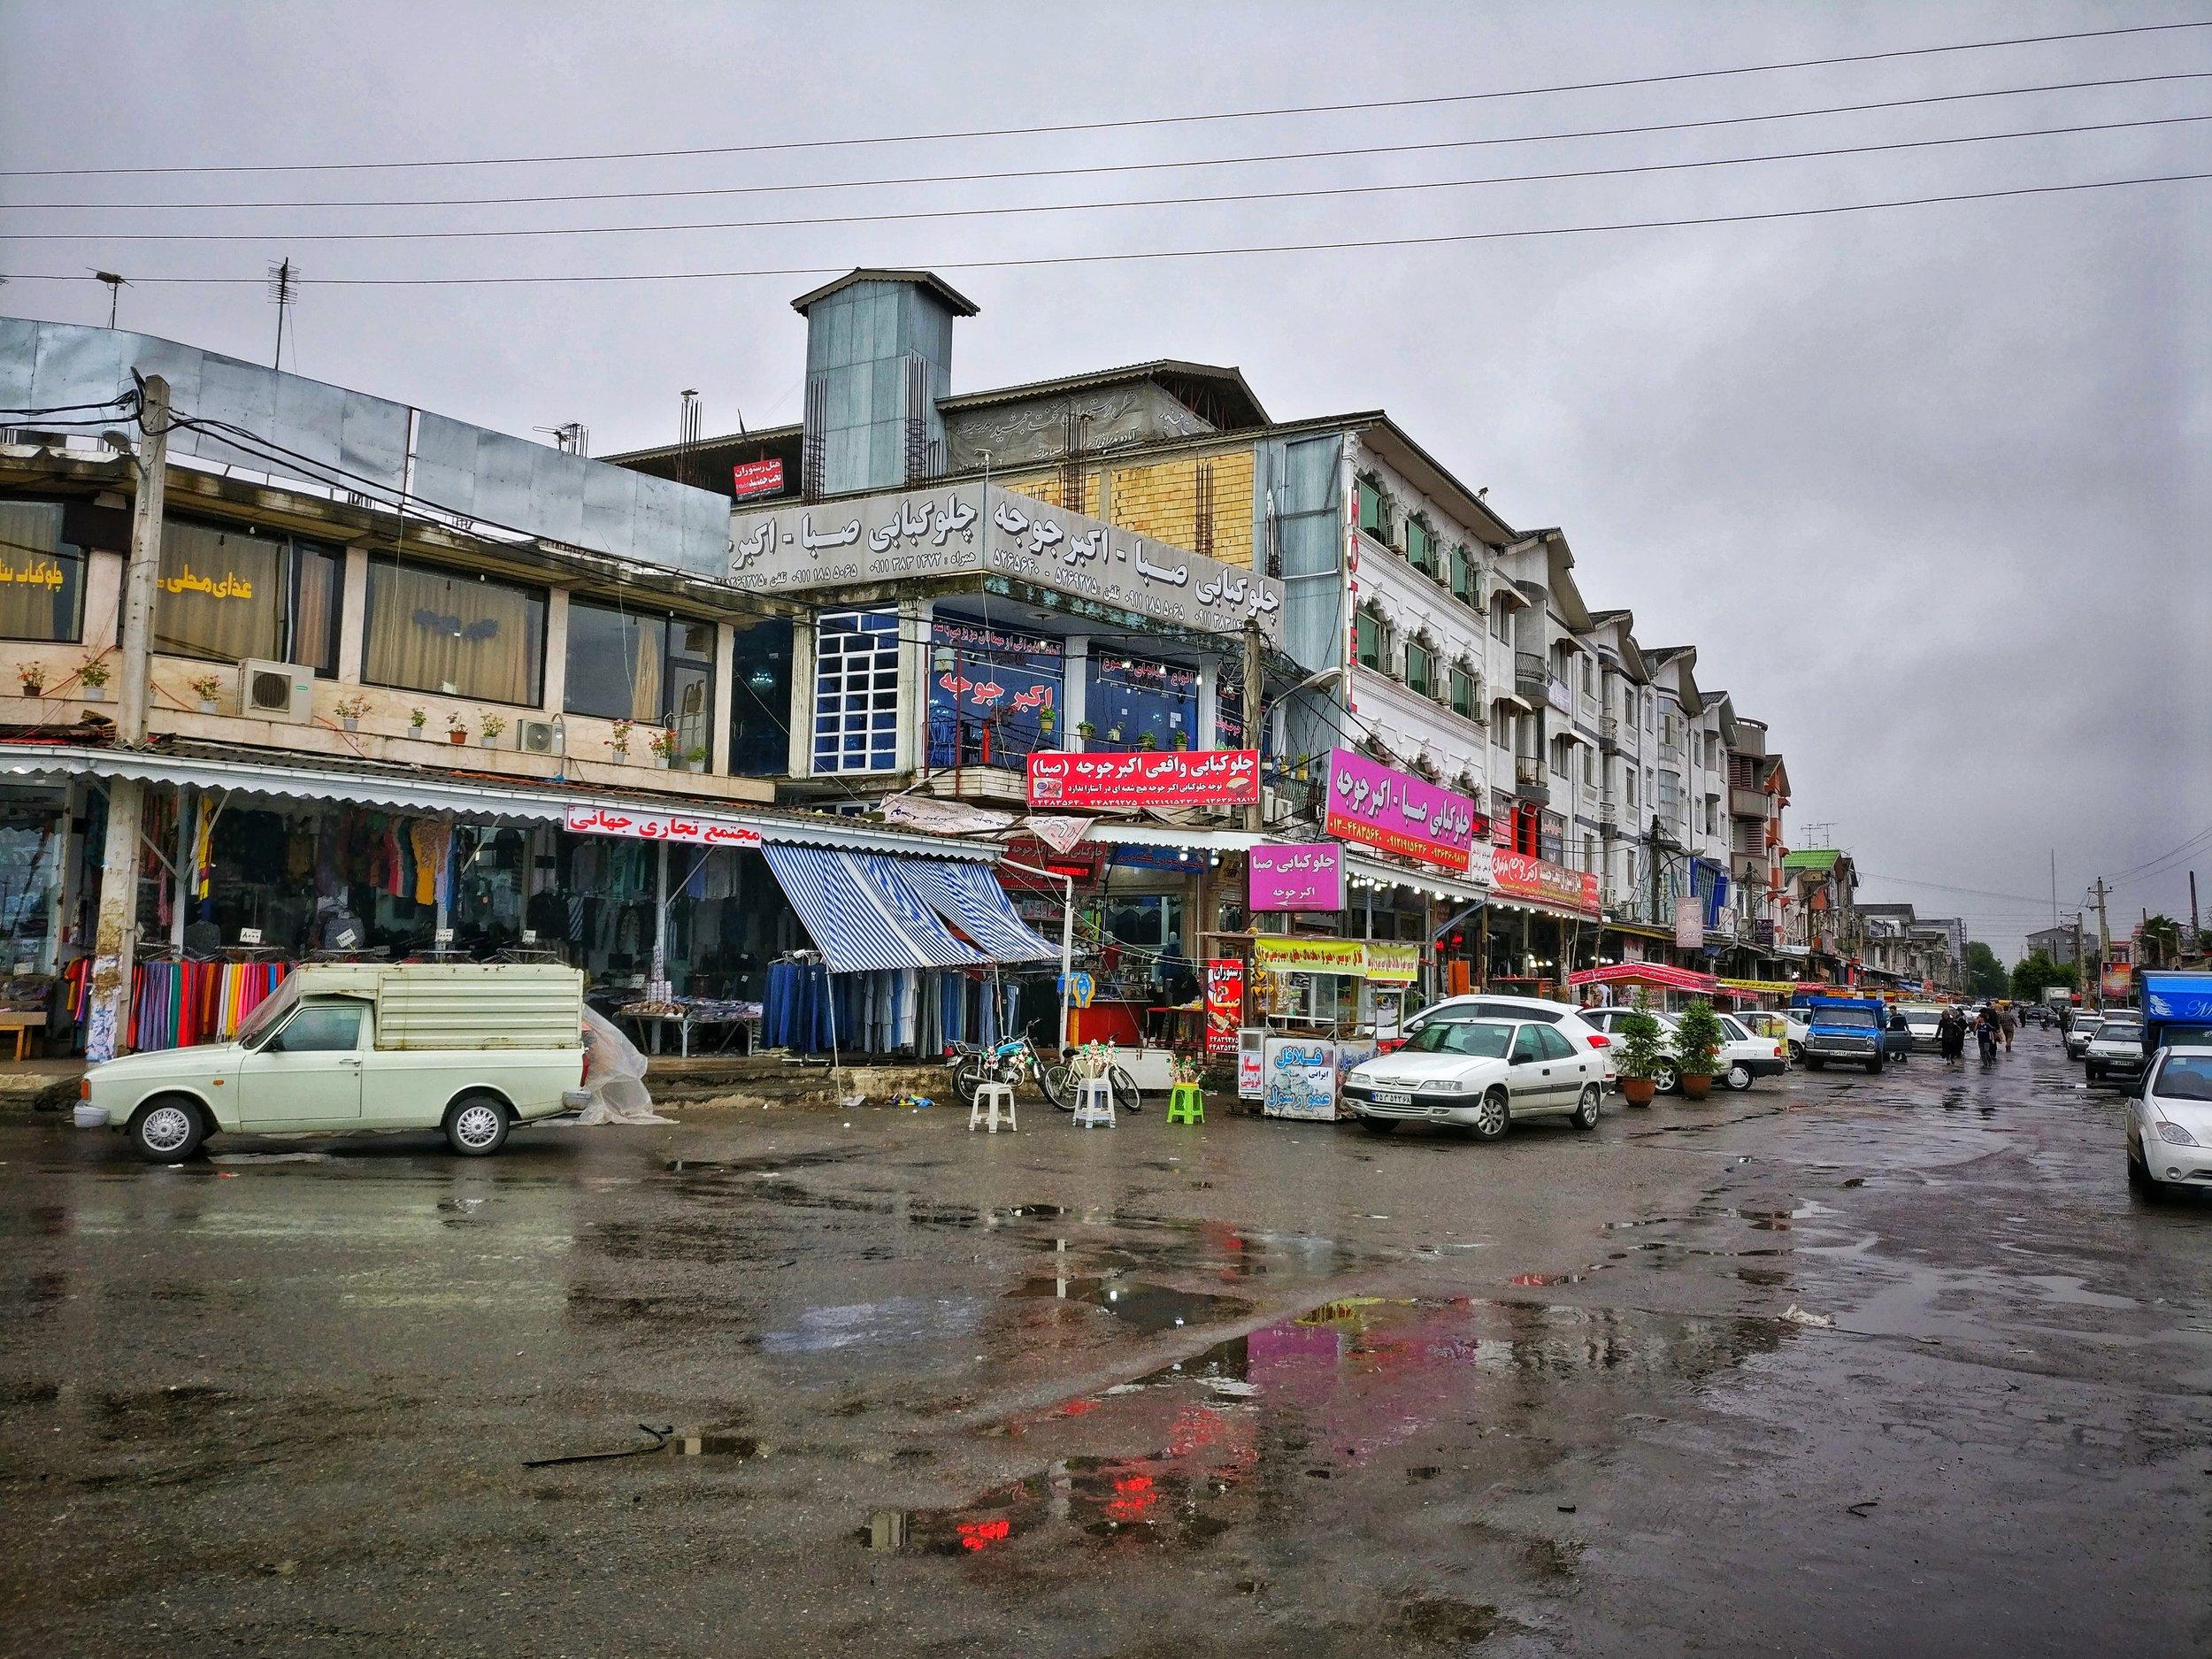 The streets of Astara